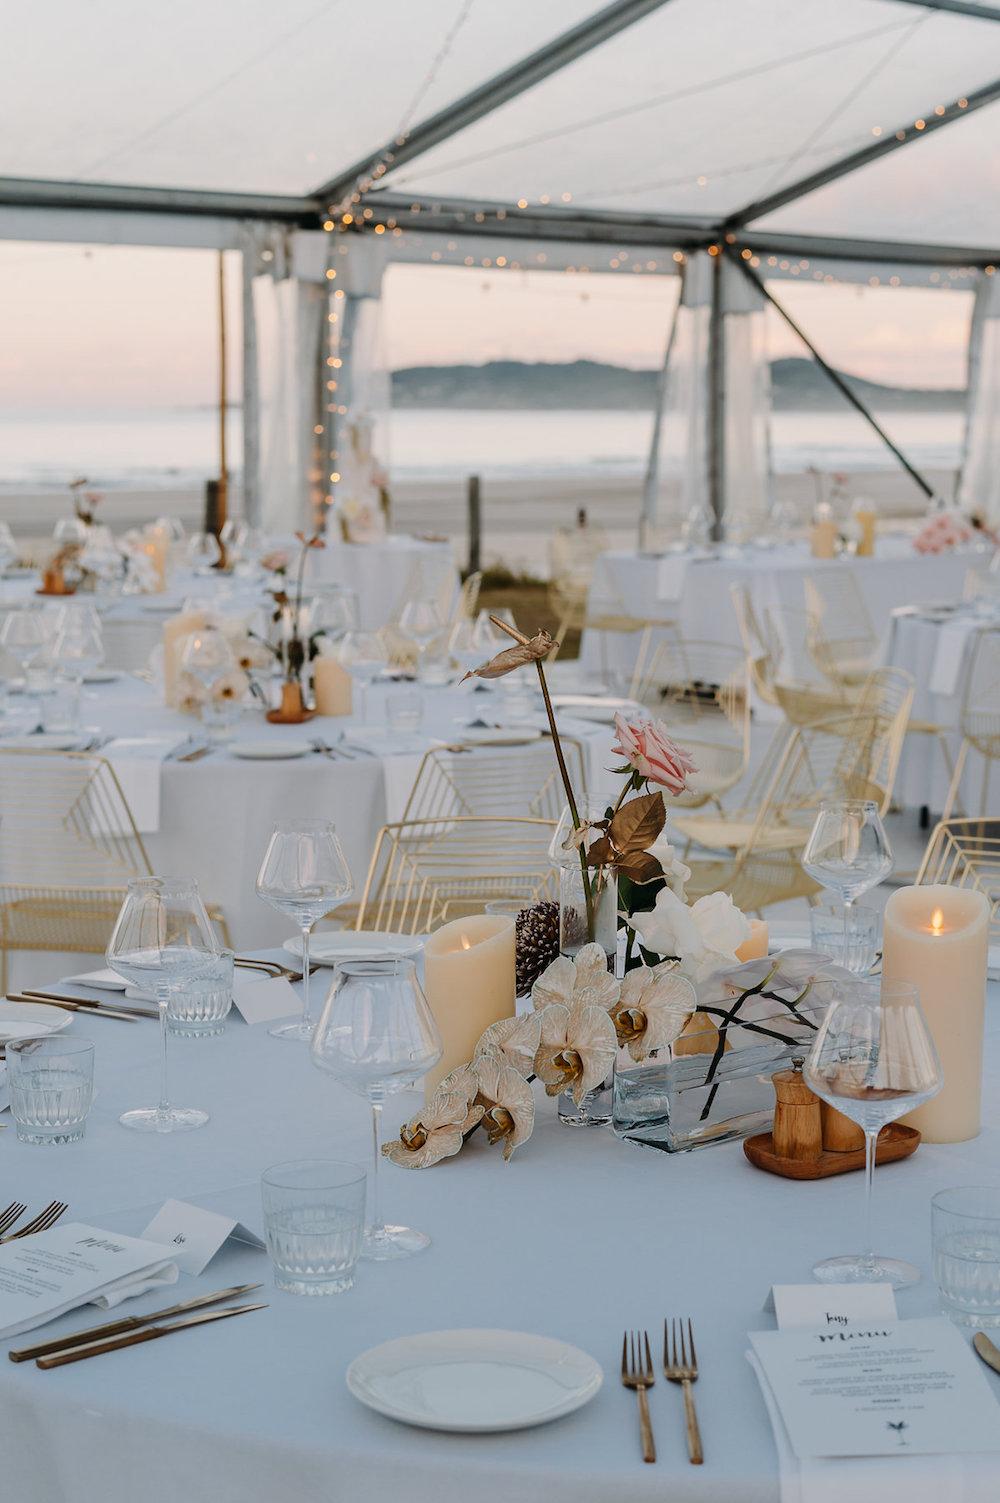 Marquee Wedding Styling Ideas Coastal Luxe2.jpg